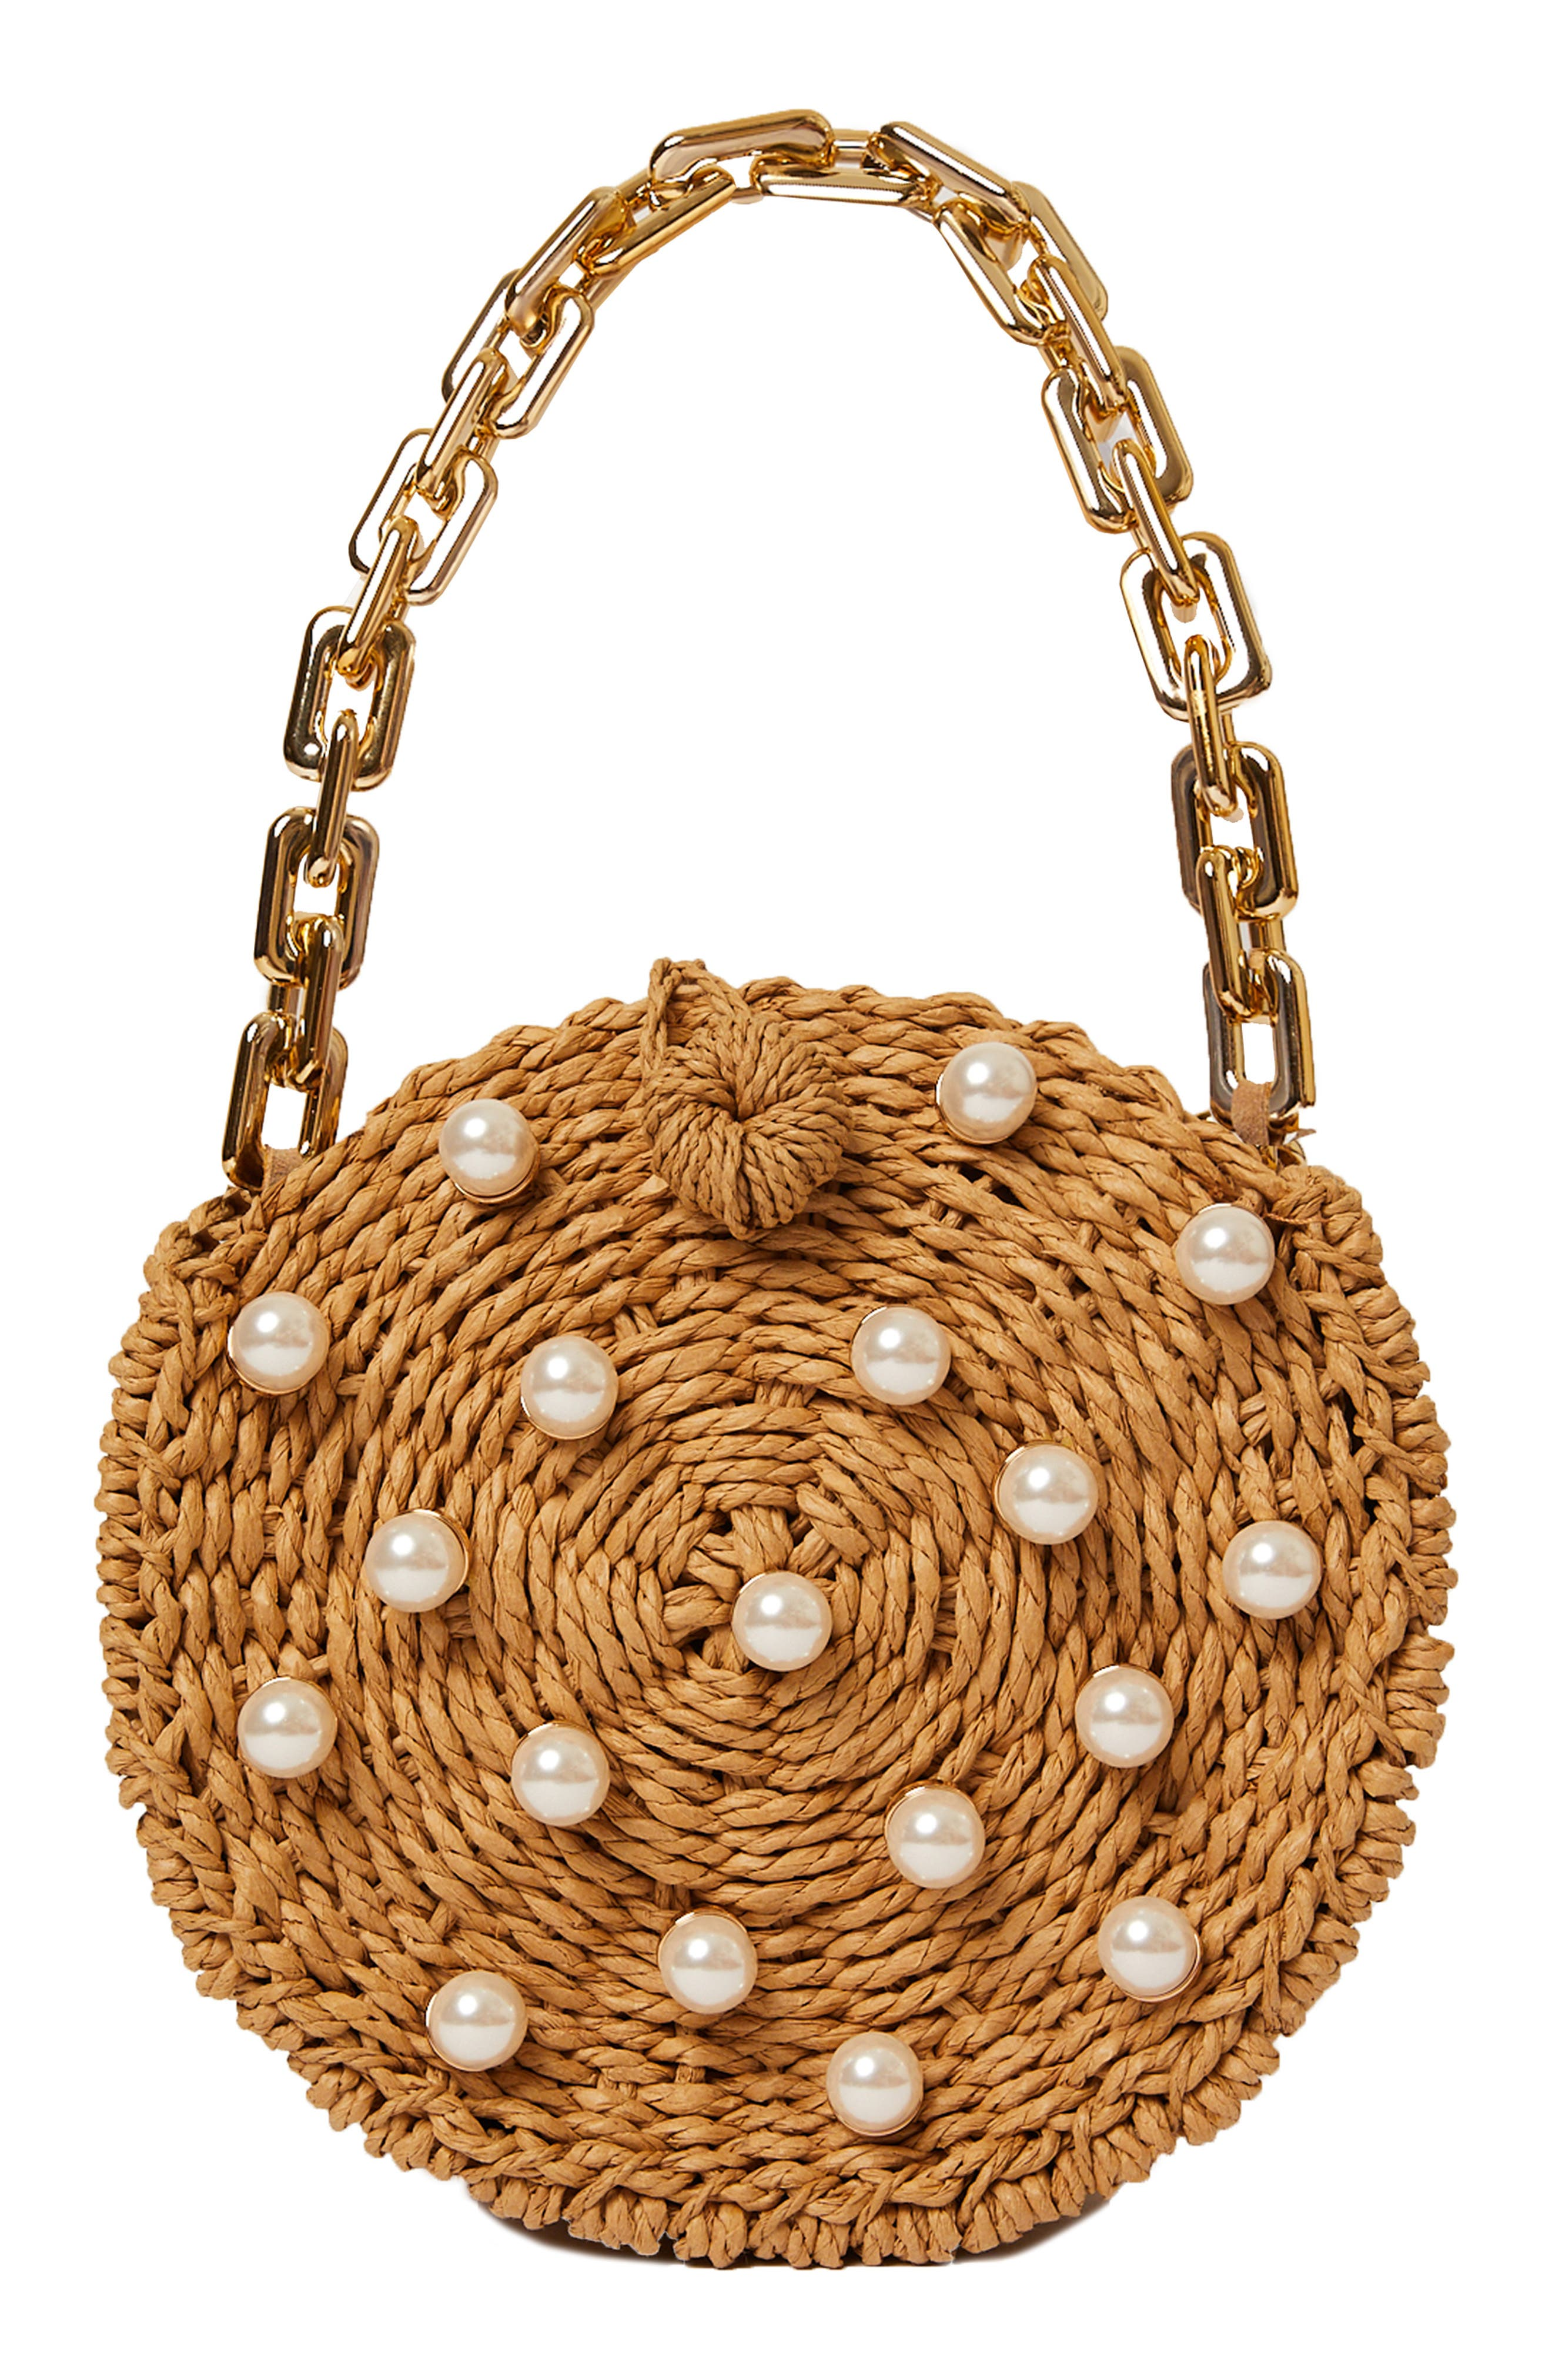 Willow Imitation Pearl Shoulder Bag